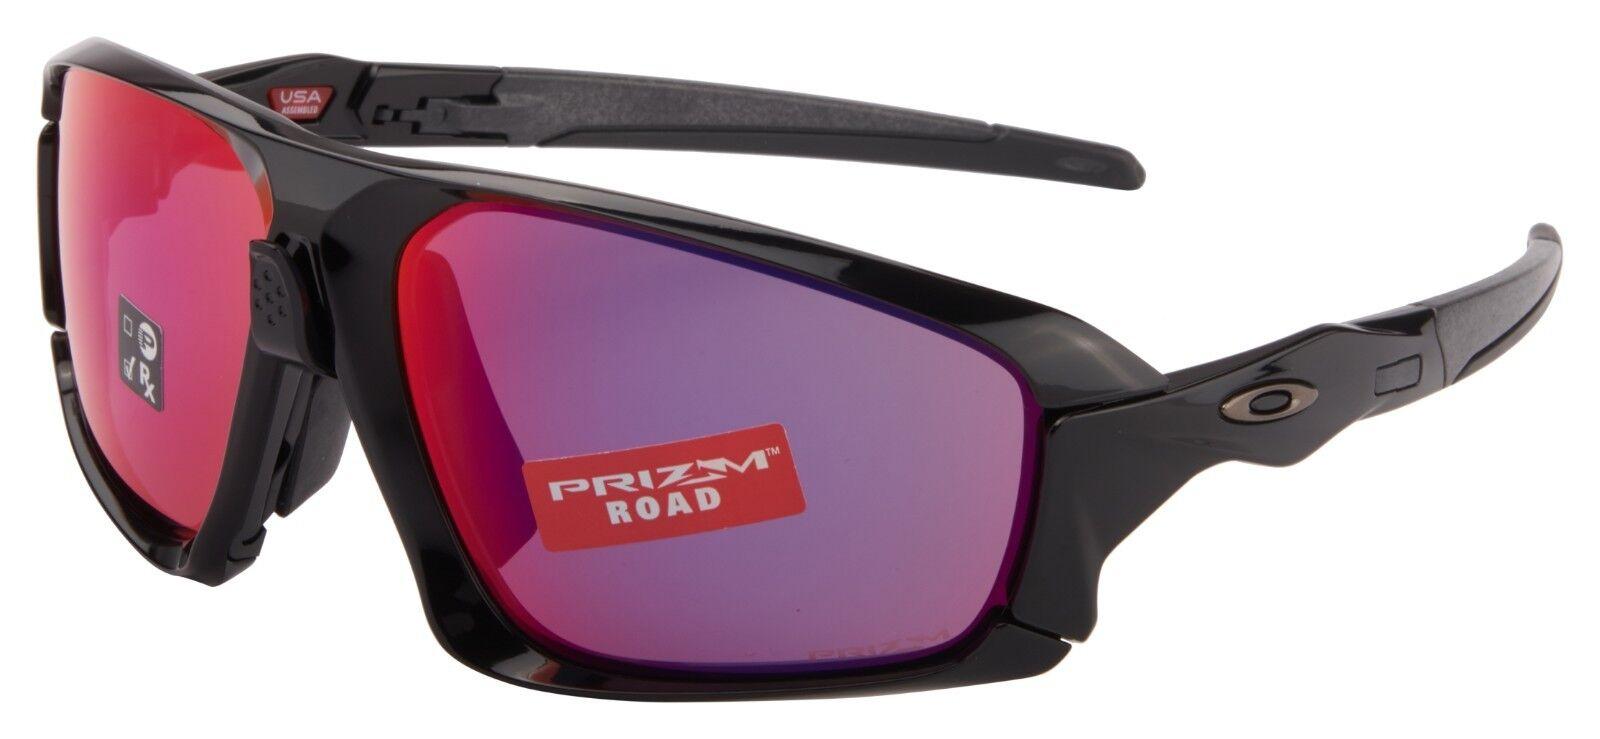 oakley-field-jacket-sunglasses-oo9402-0164-polished-black-prizm-road-lens-nib